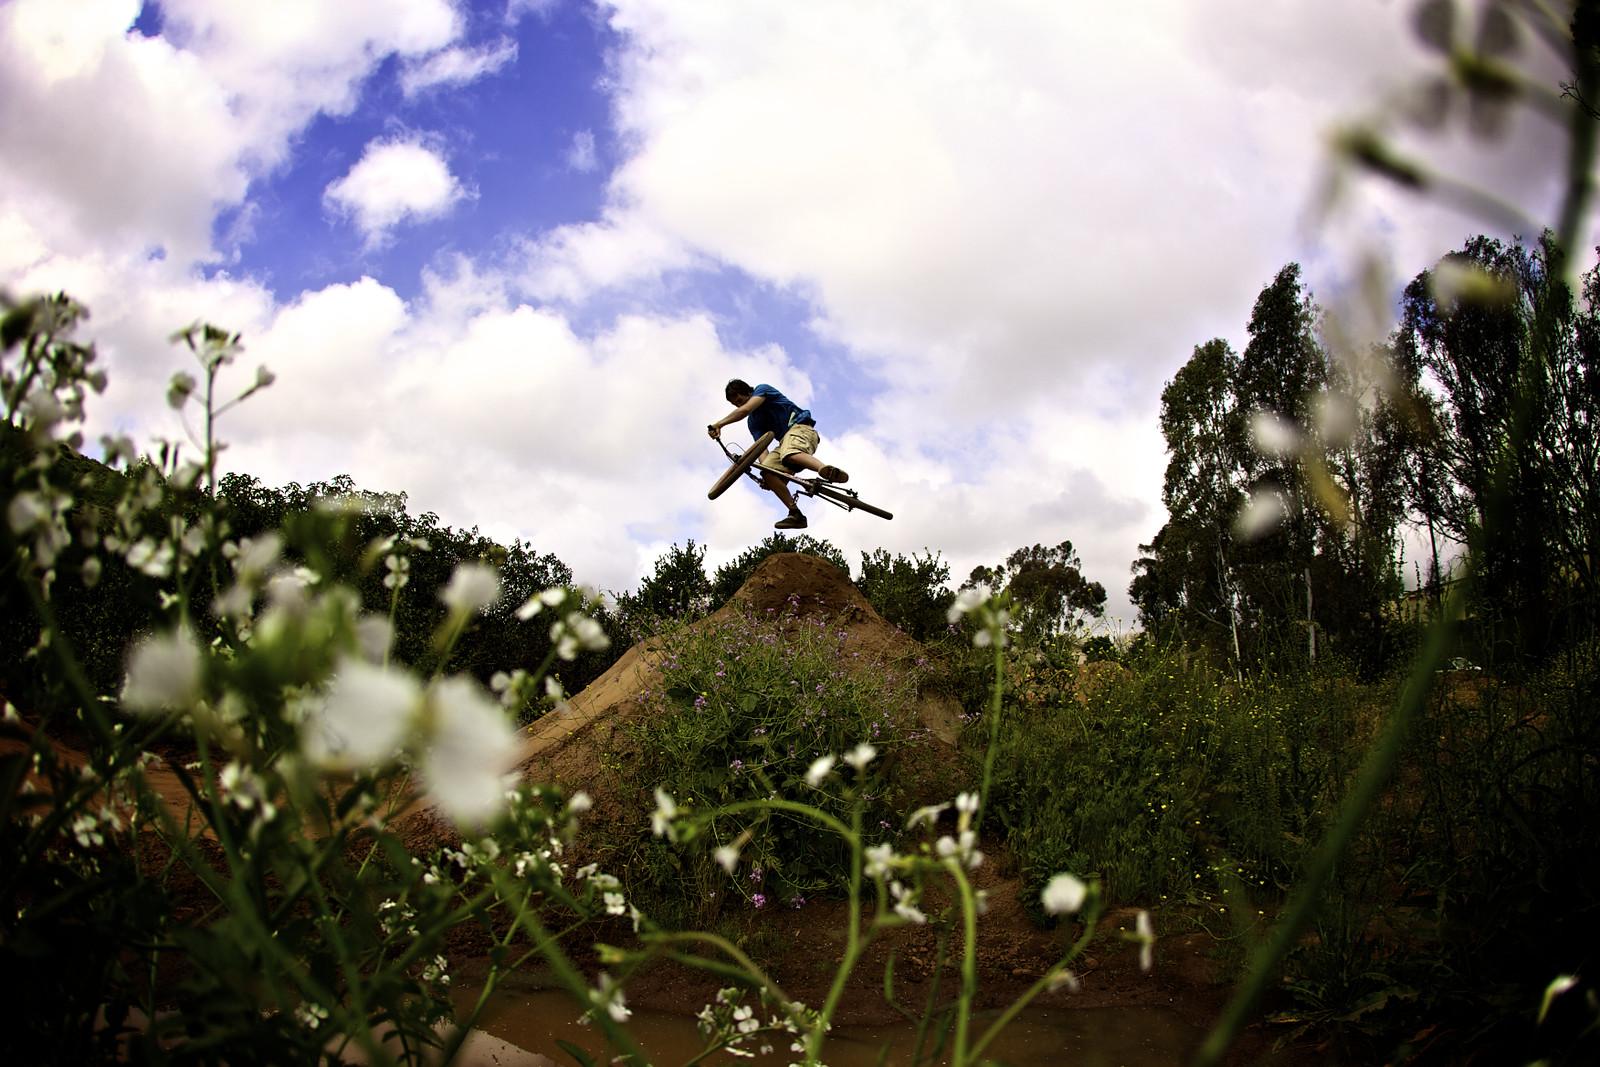 DBIBS RANCHO TEPPER - corytepper.com - Mountain Biking Pictures - Vital MTB